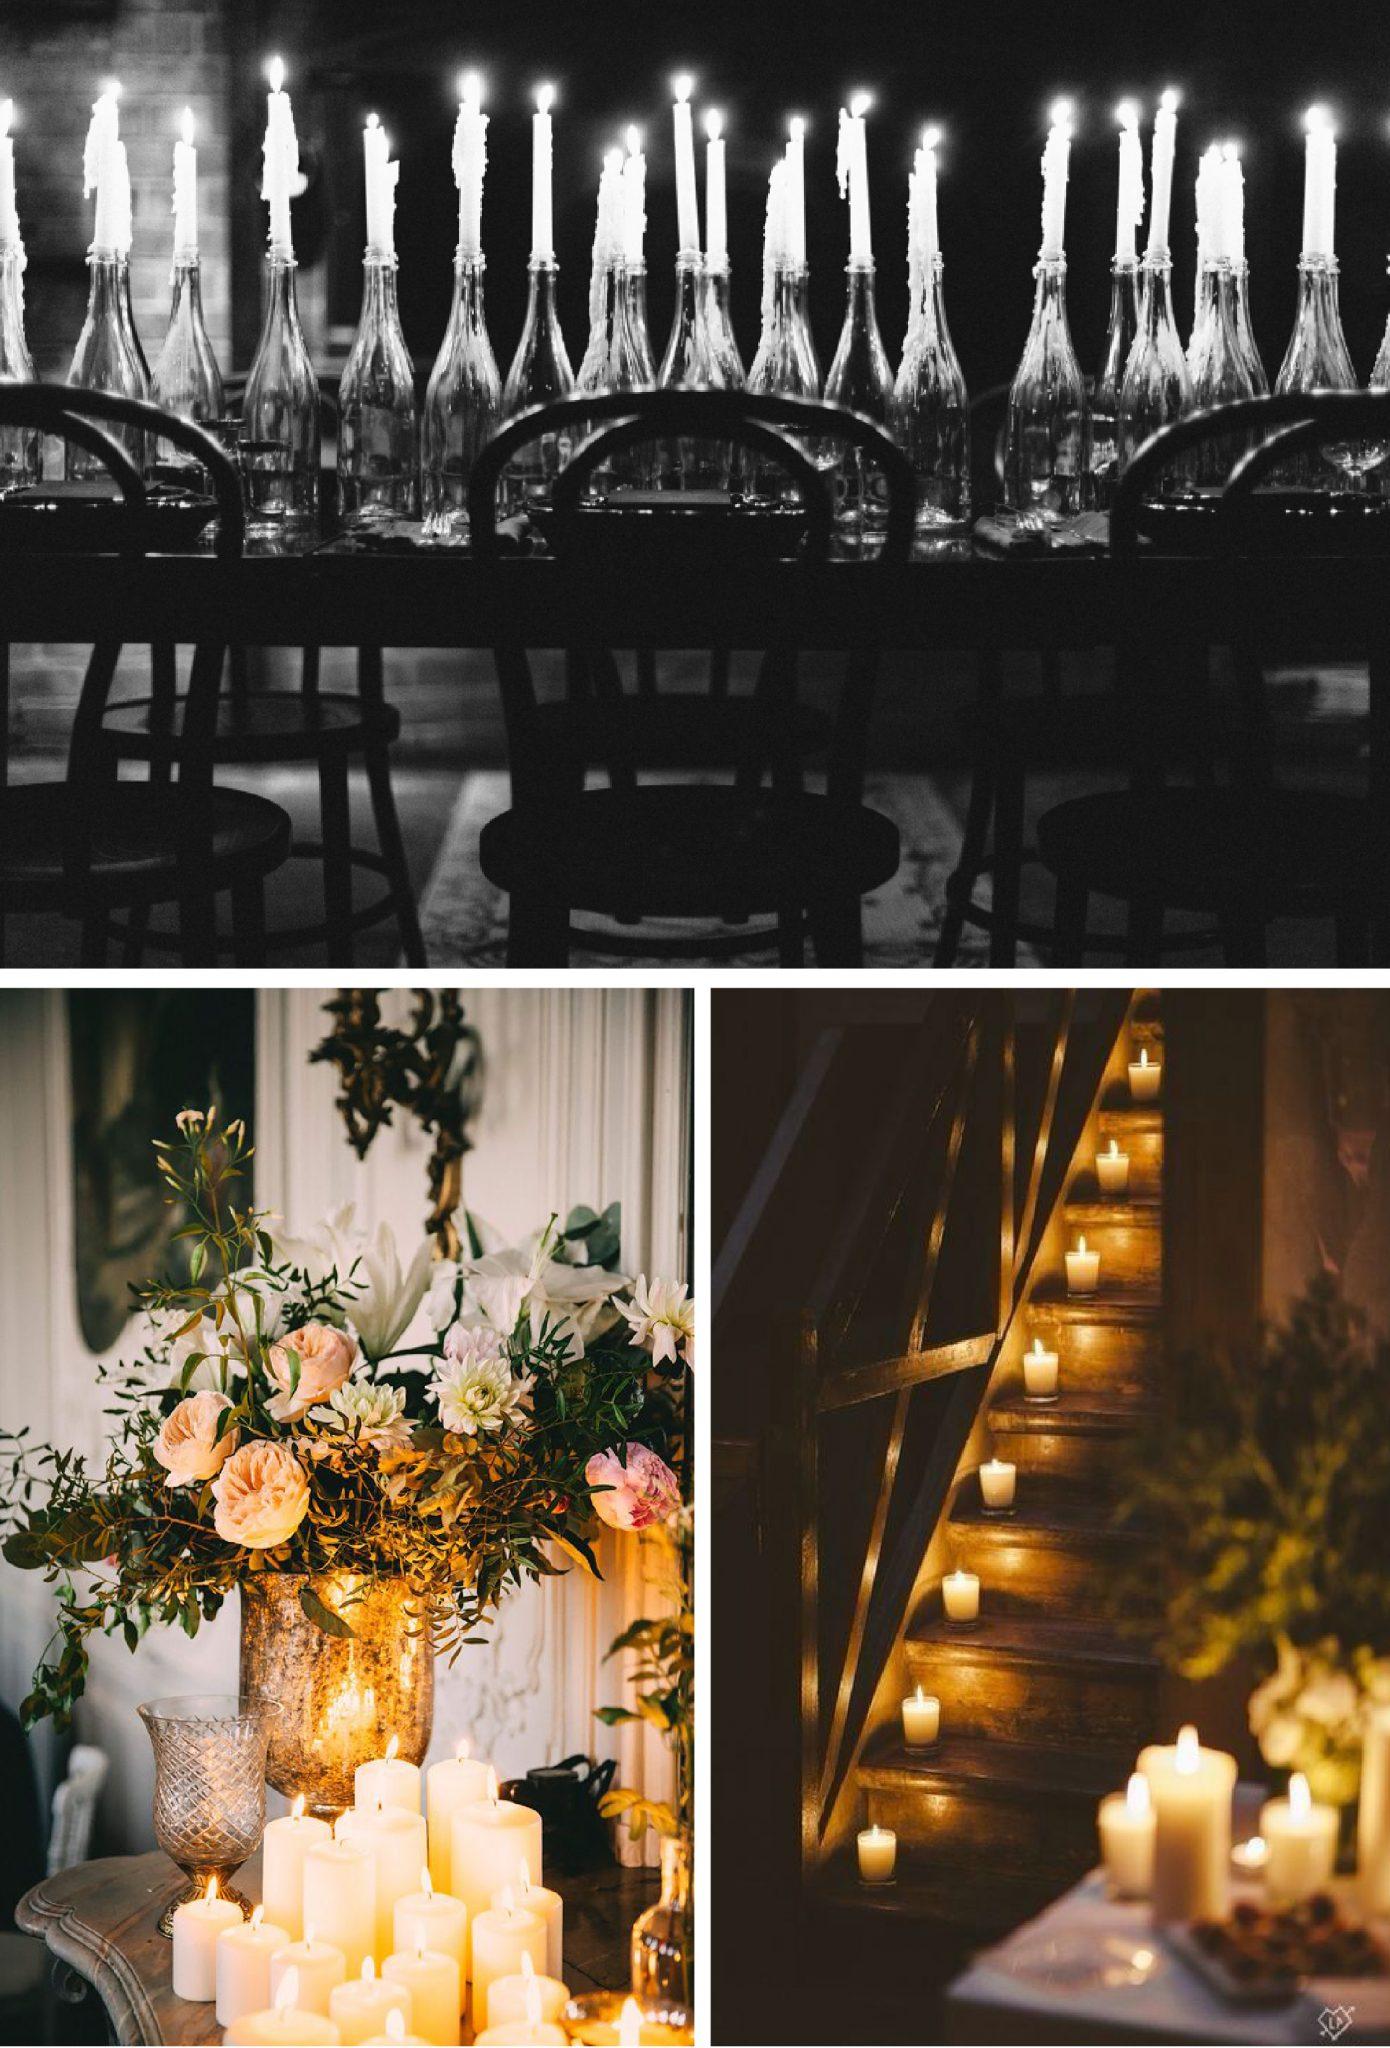 wedding planner organisateur de mariage wikip dia. Black Bedroom Furniture Sets. Home Design Ideas